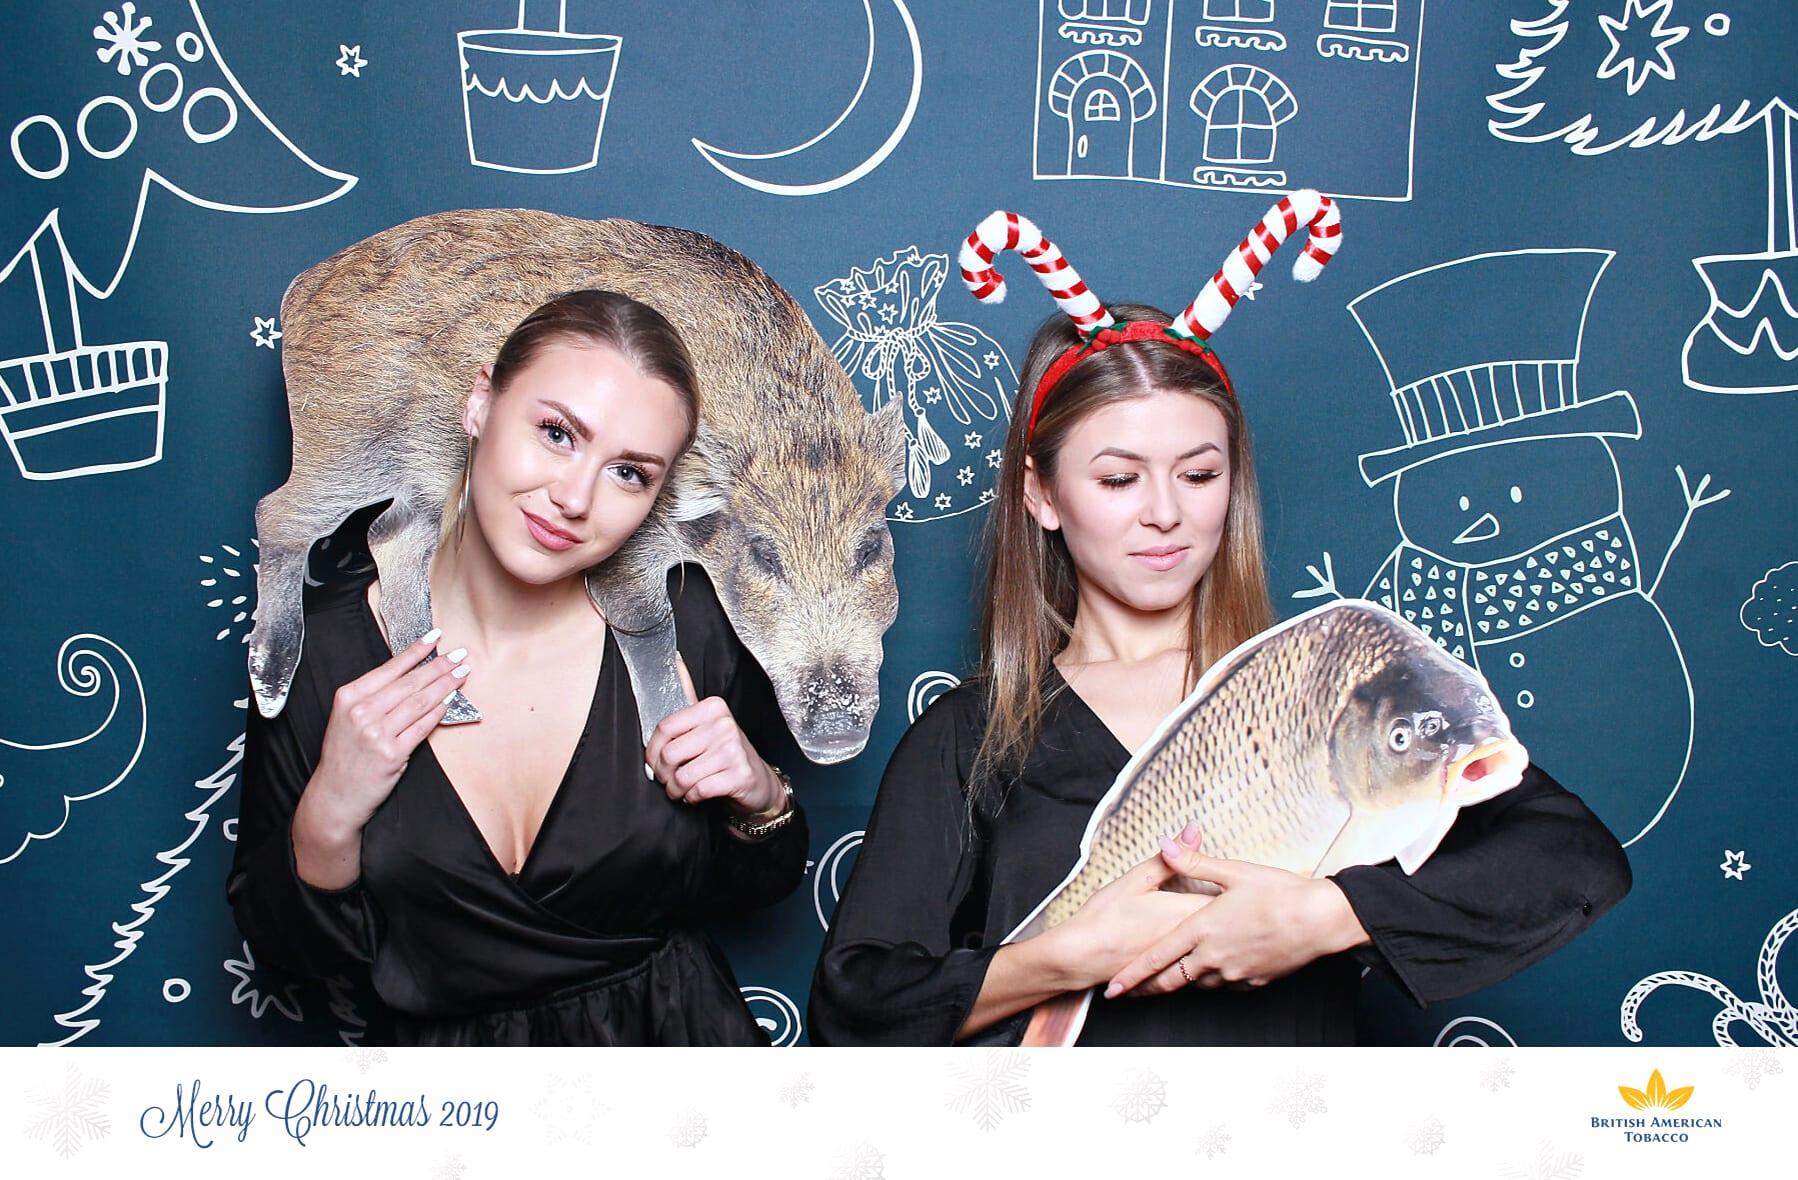 fotokoutek-praha-vanocni-vecirek-bat-4-12-2019-678667